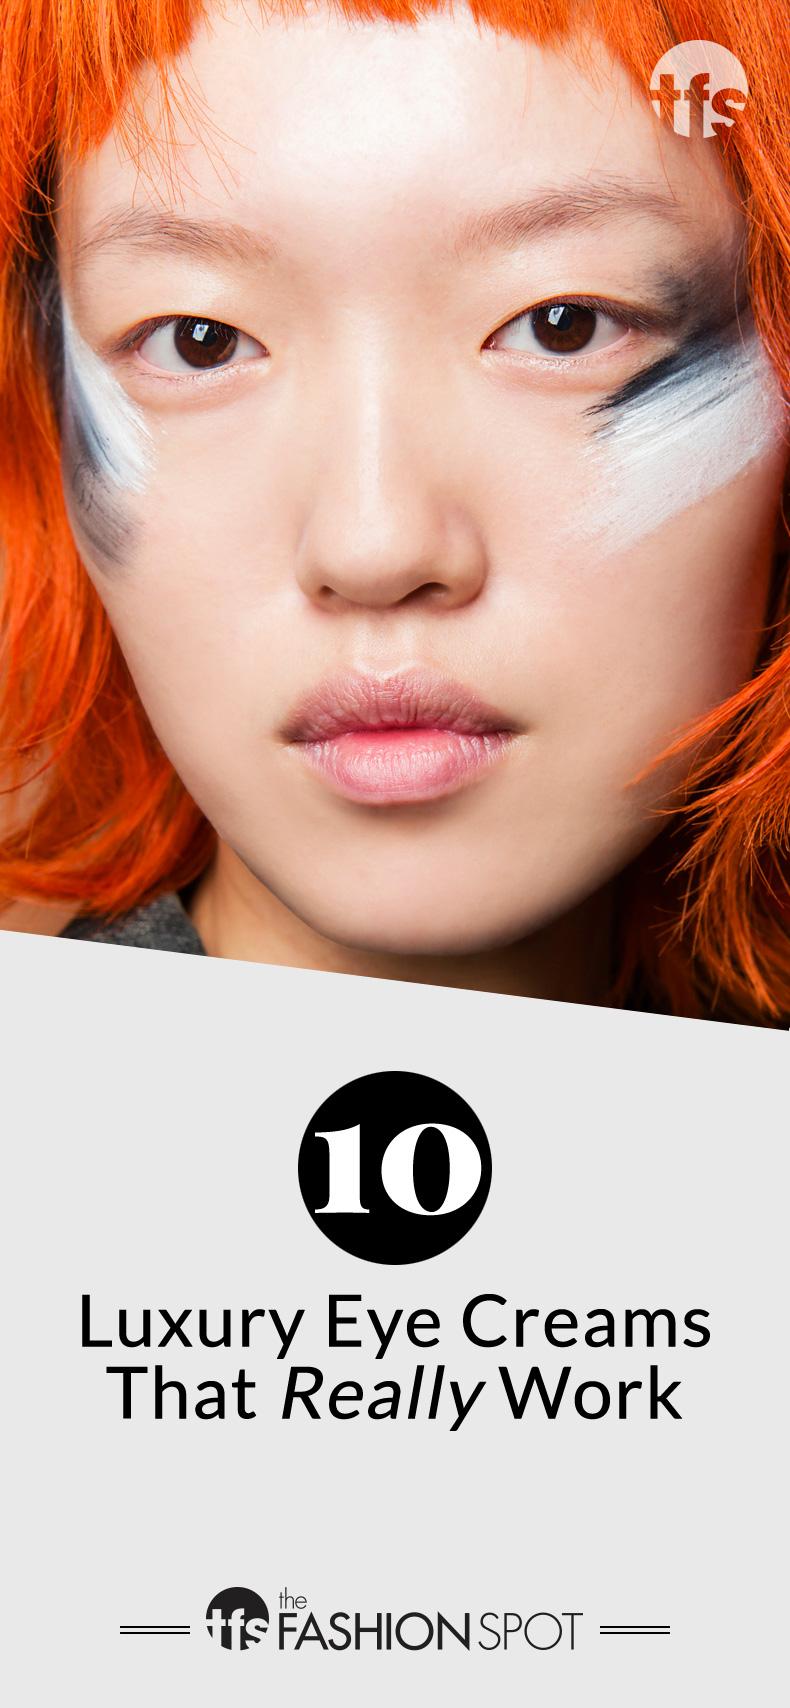 Best luxury eye creams that really work